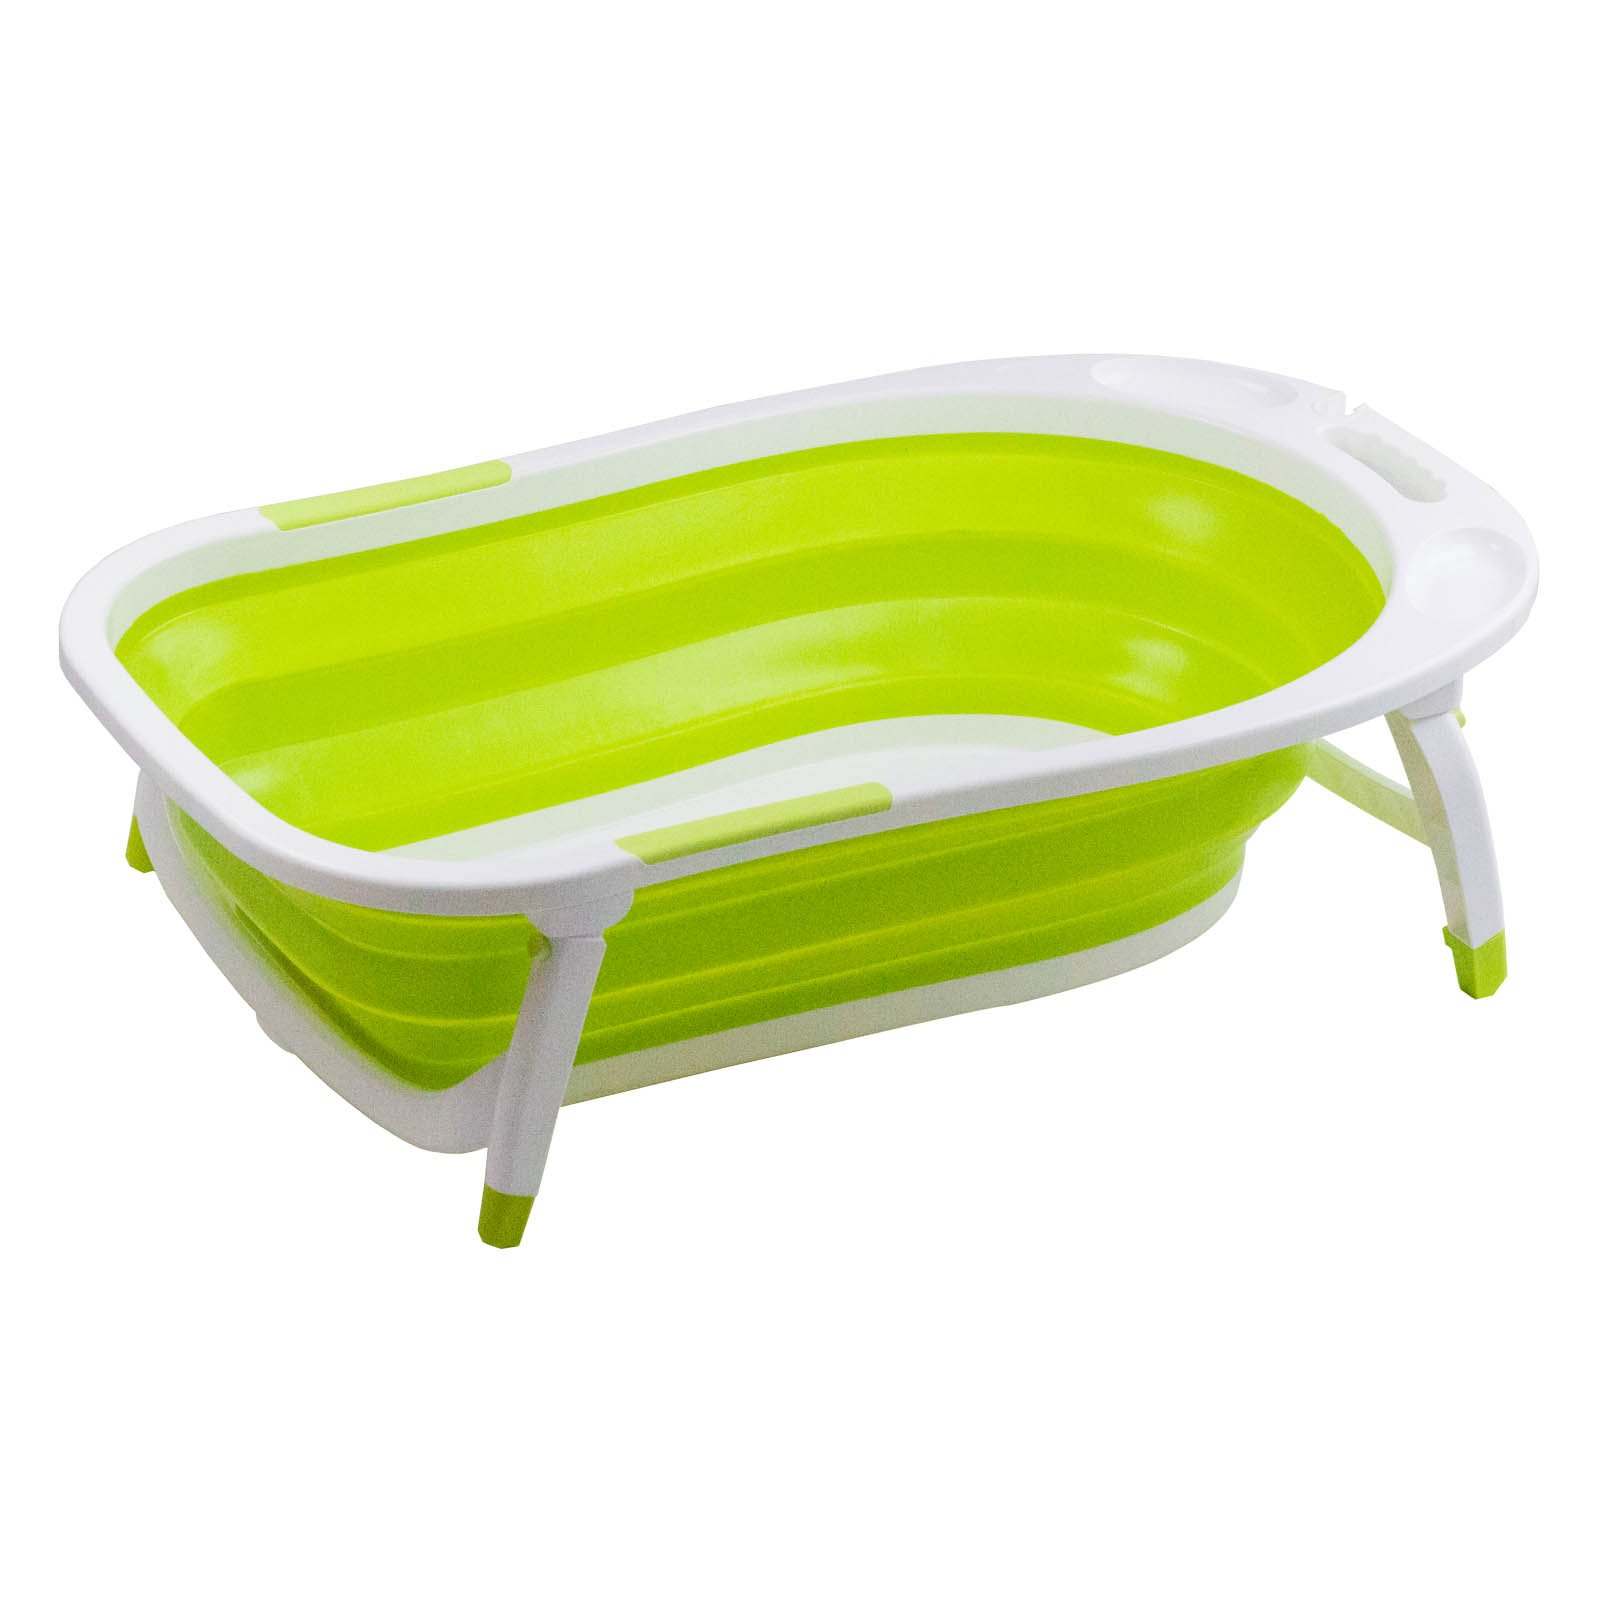 Thau tắm bé - xếp gọn Lucky Baby - Foldable Bath Tub  84(L)X51W)X23(H) (PP+TPR) 8833